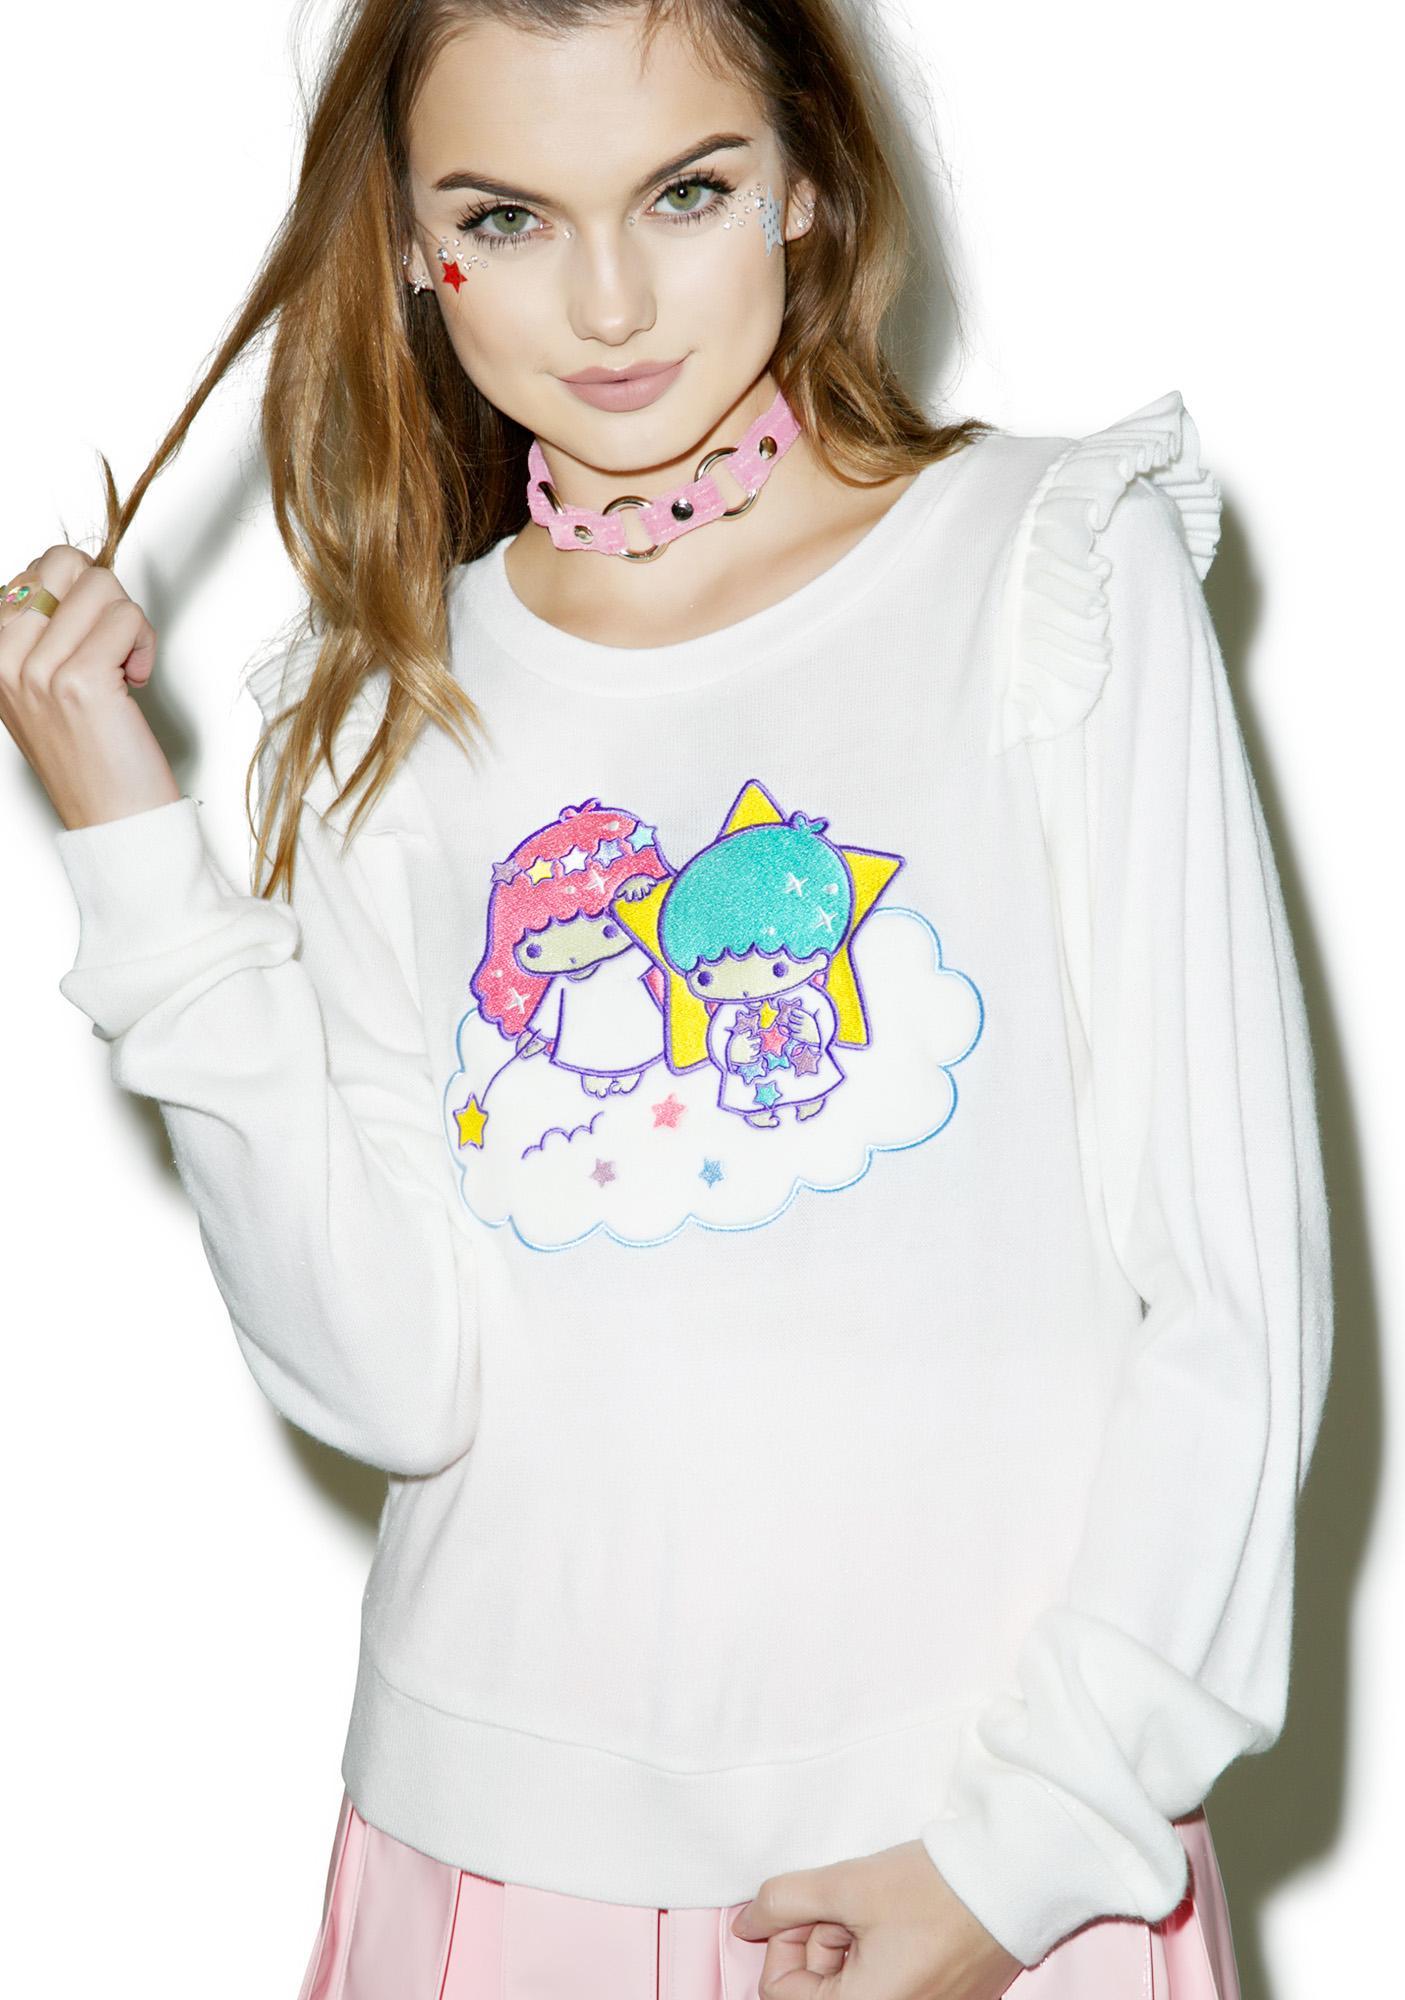 Japan L.A. Little Twin Stars Knit Ruffled Sweater